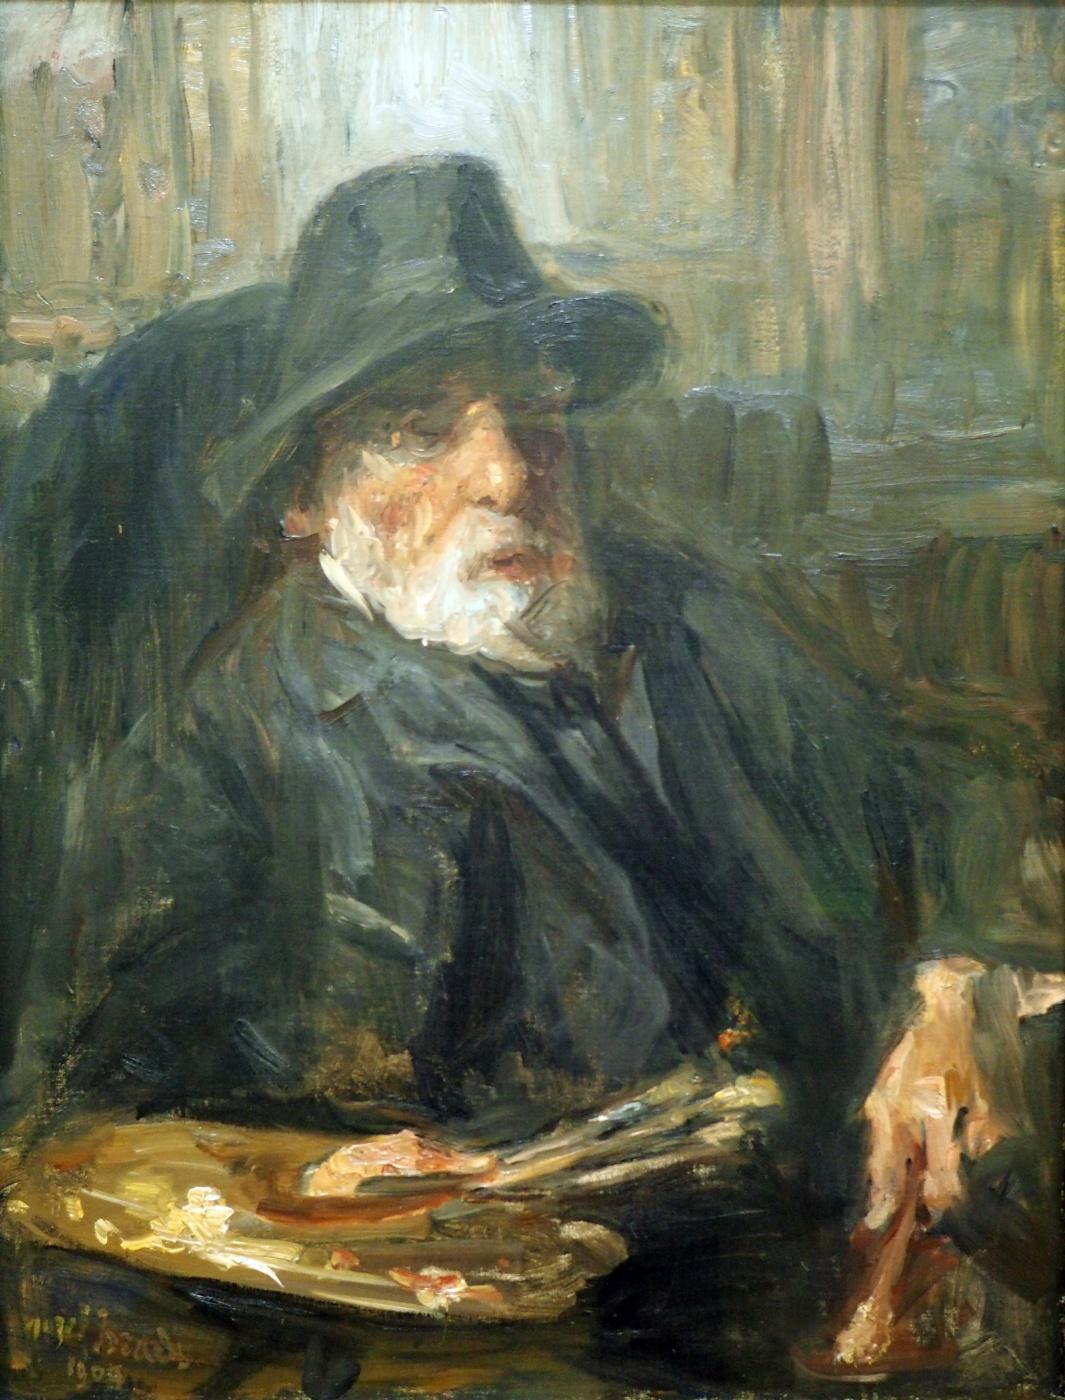 Joseph Israel. Self-portrait